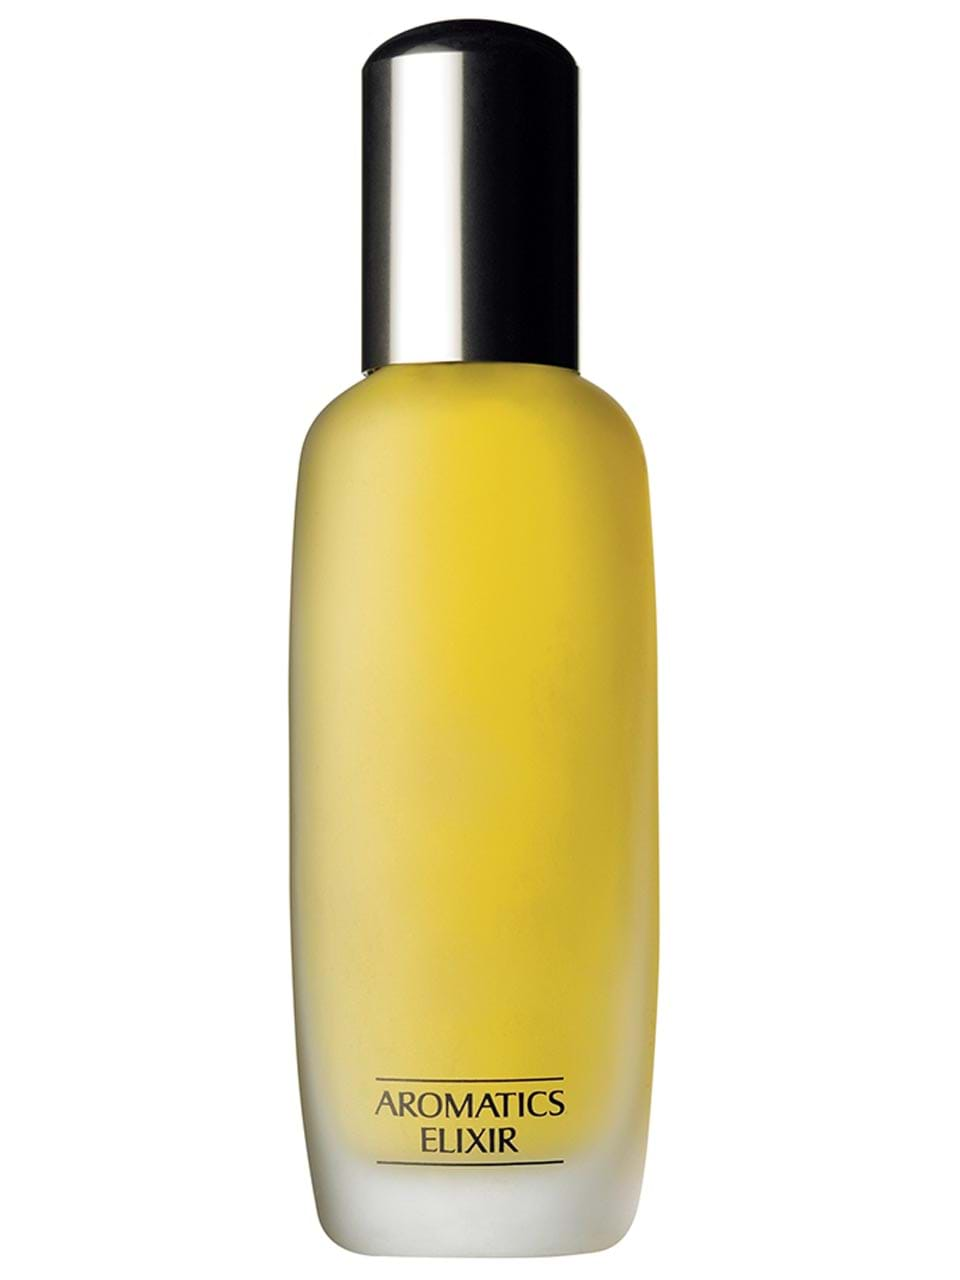 Ml Aromatics Eau Clinique Parfum Elixir 45 De 1JlKT3cF